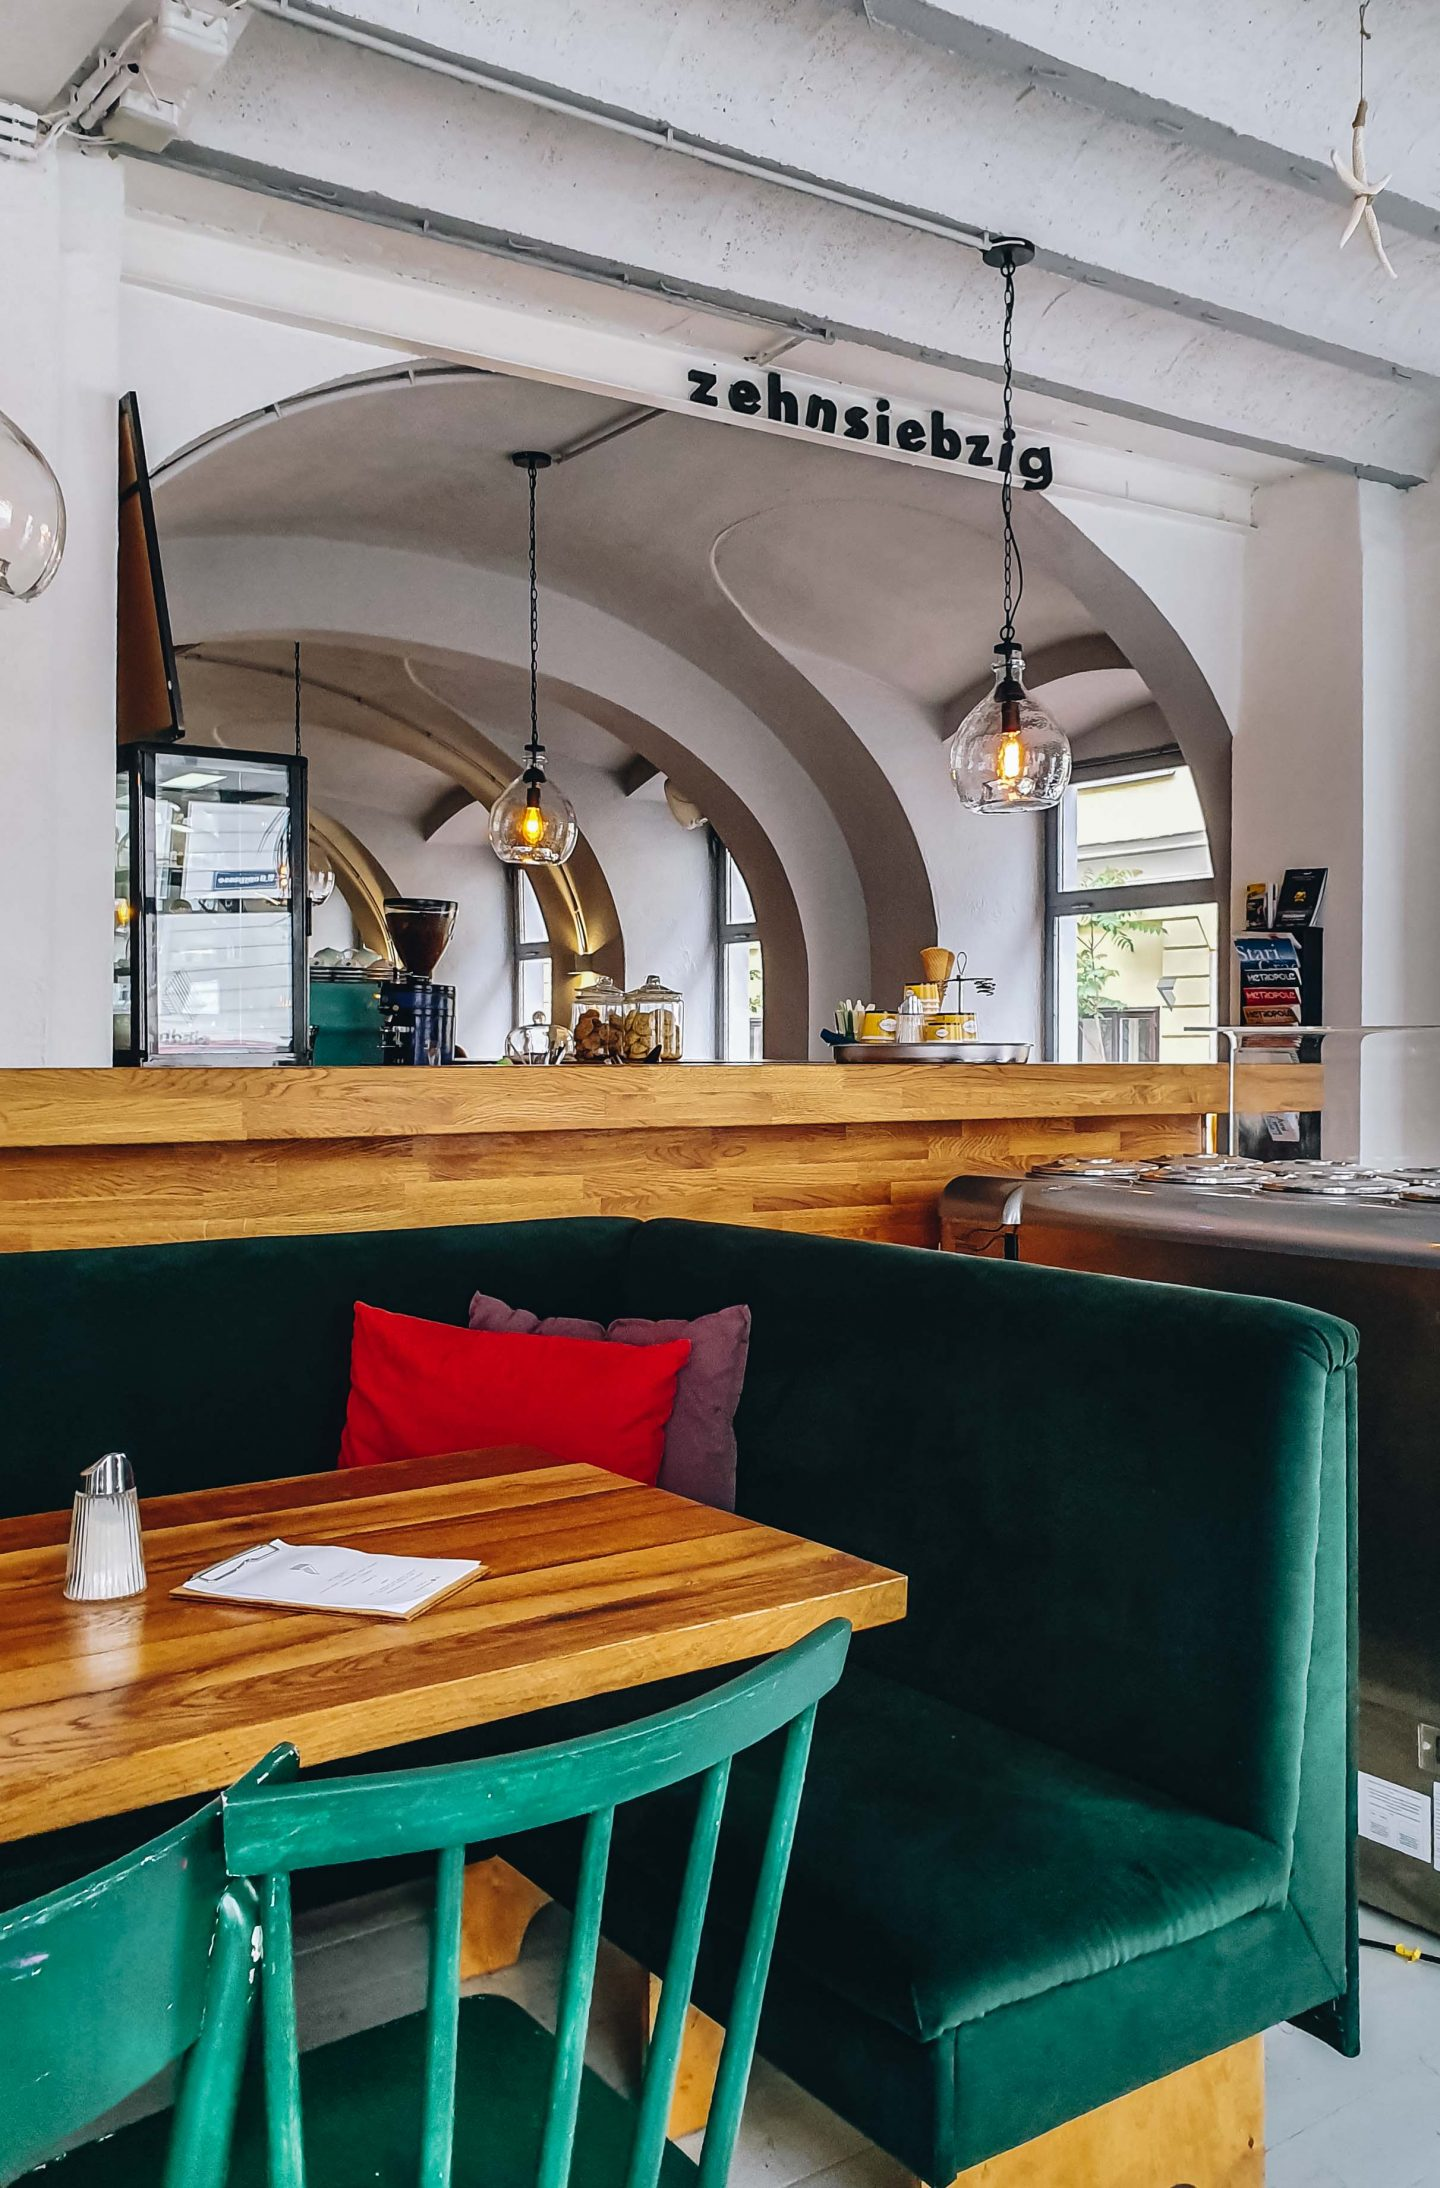 Wien Frühstückslokale gesund